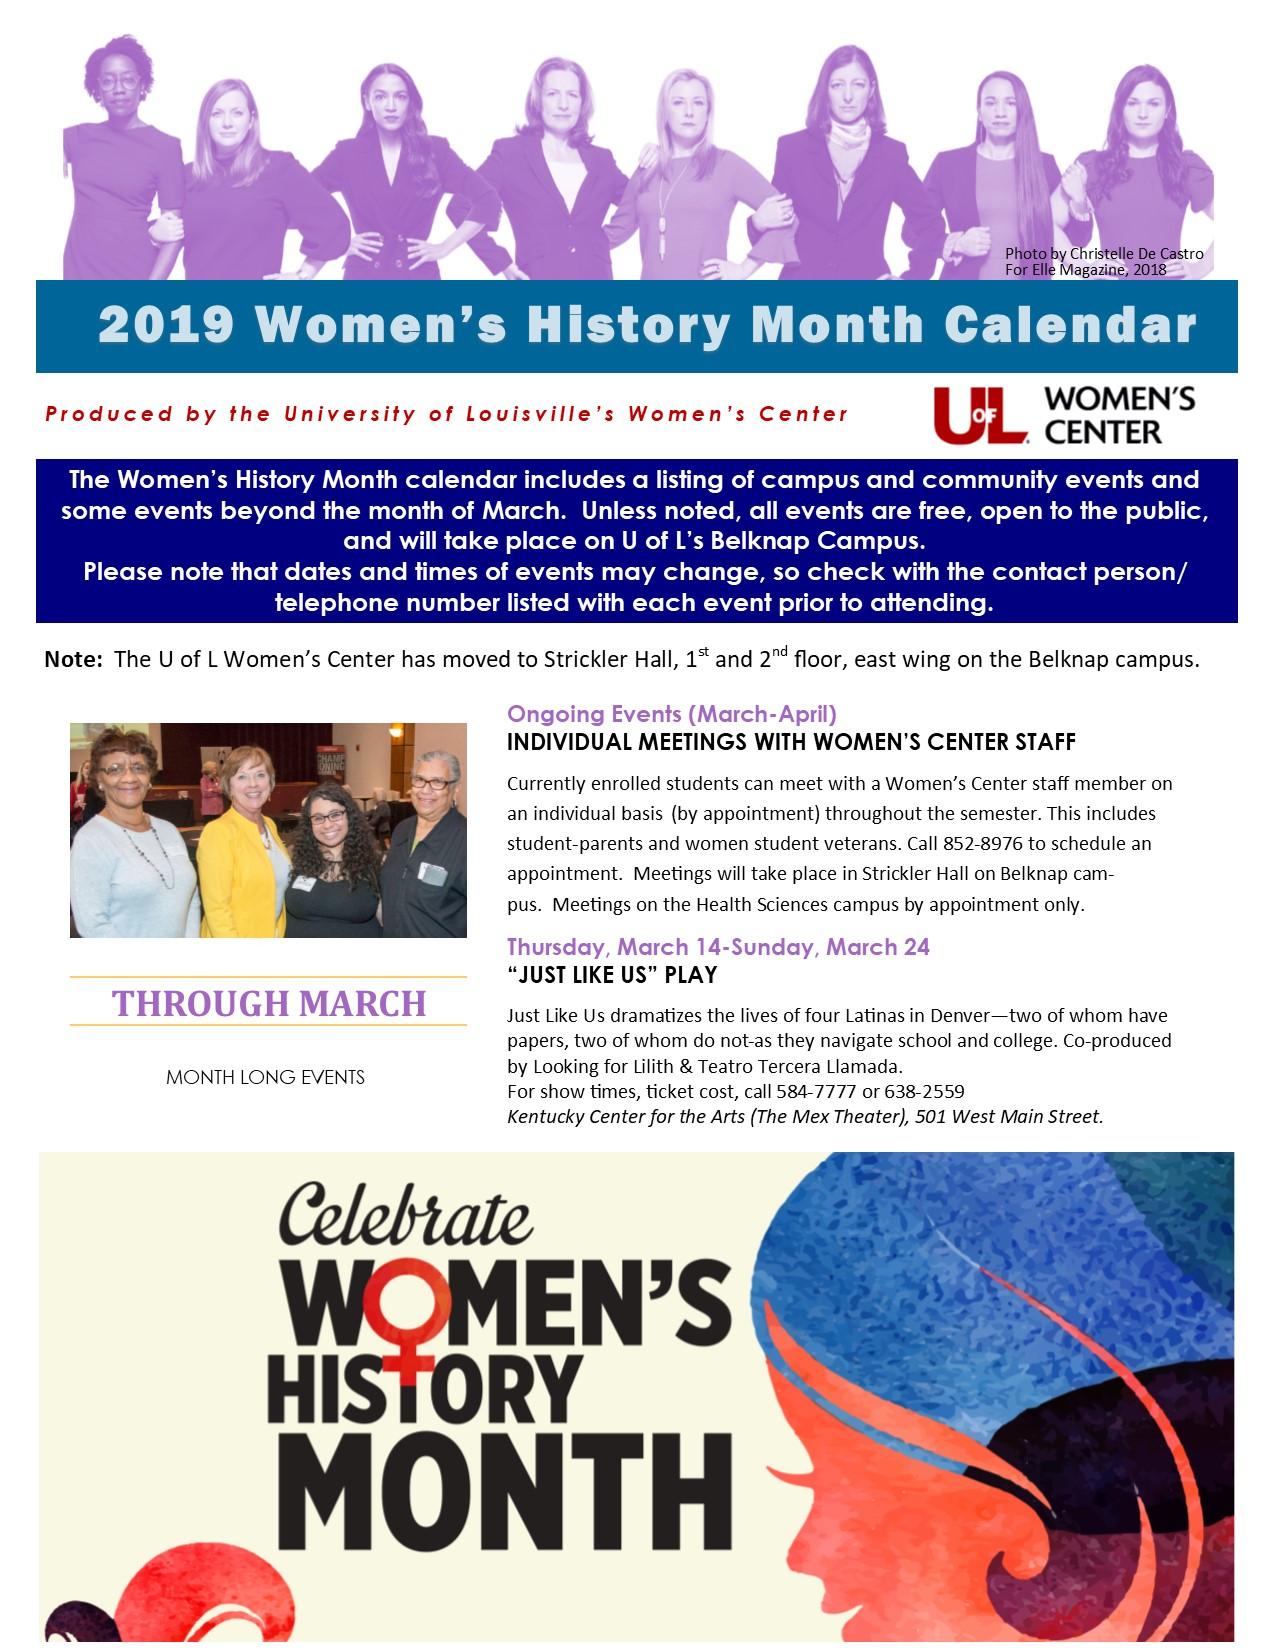 University Of Louisville Calendar 2019 Women's History Month 2019 — Women's Center